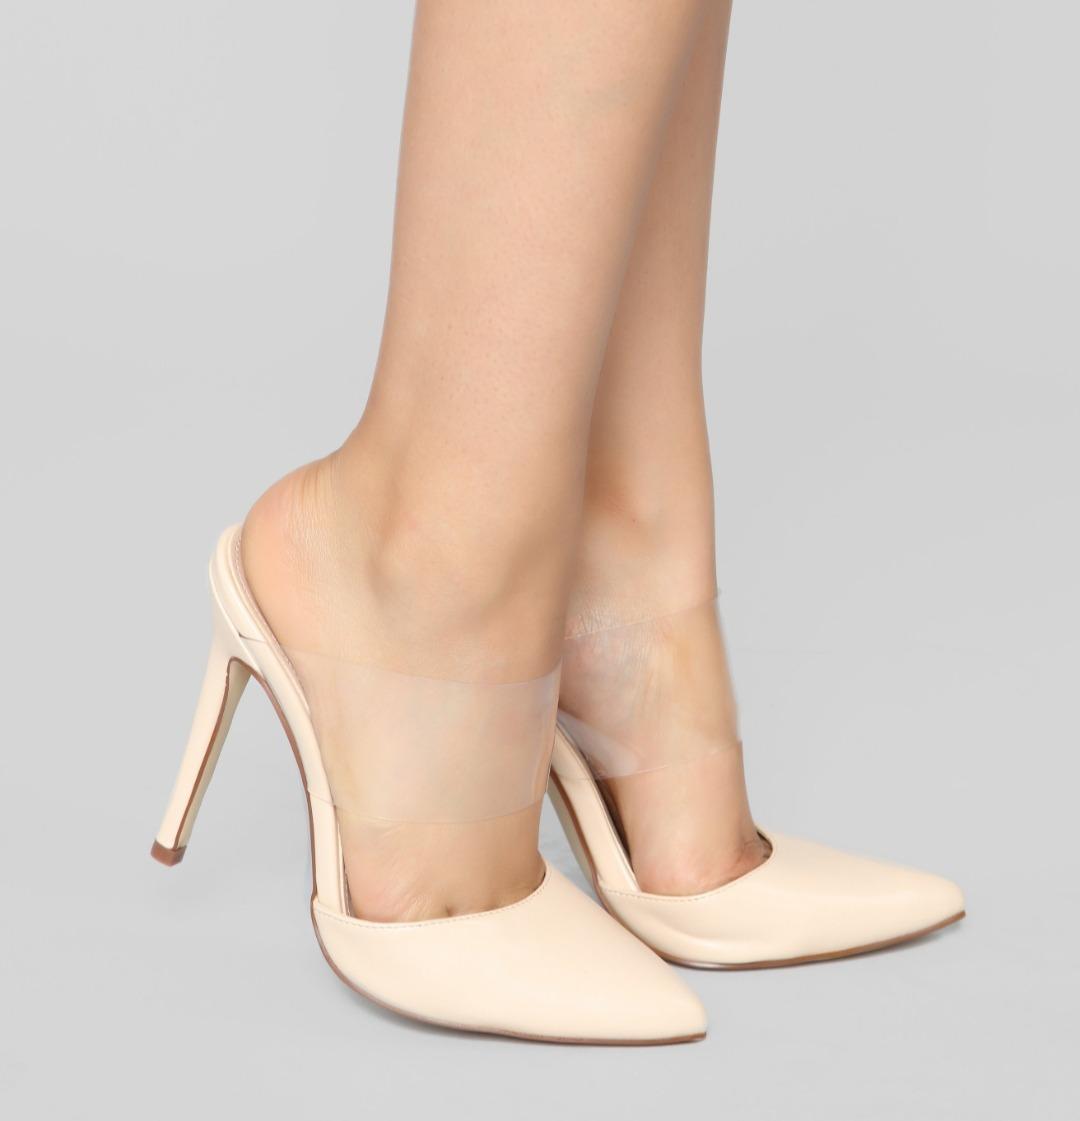 f1b718a2 Zapatos De Tacón Color Nude - $ 220.000 en Mercado Libre